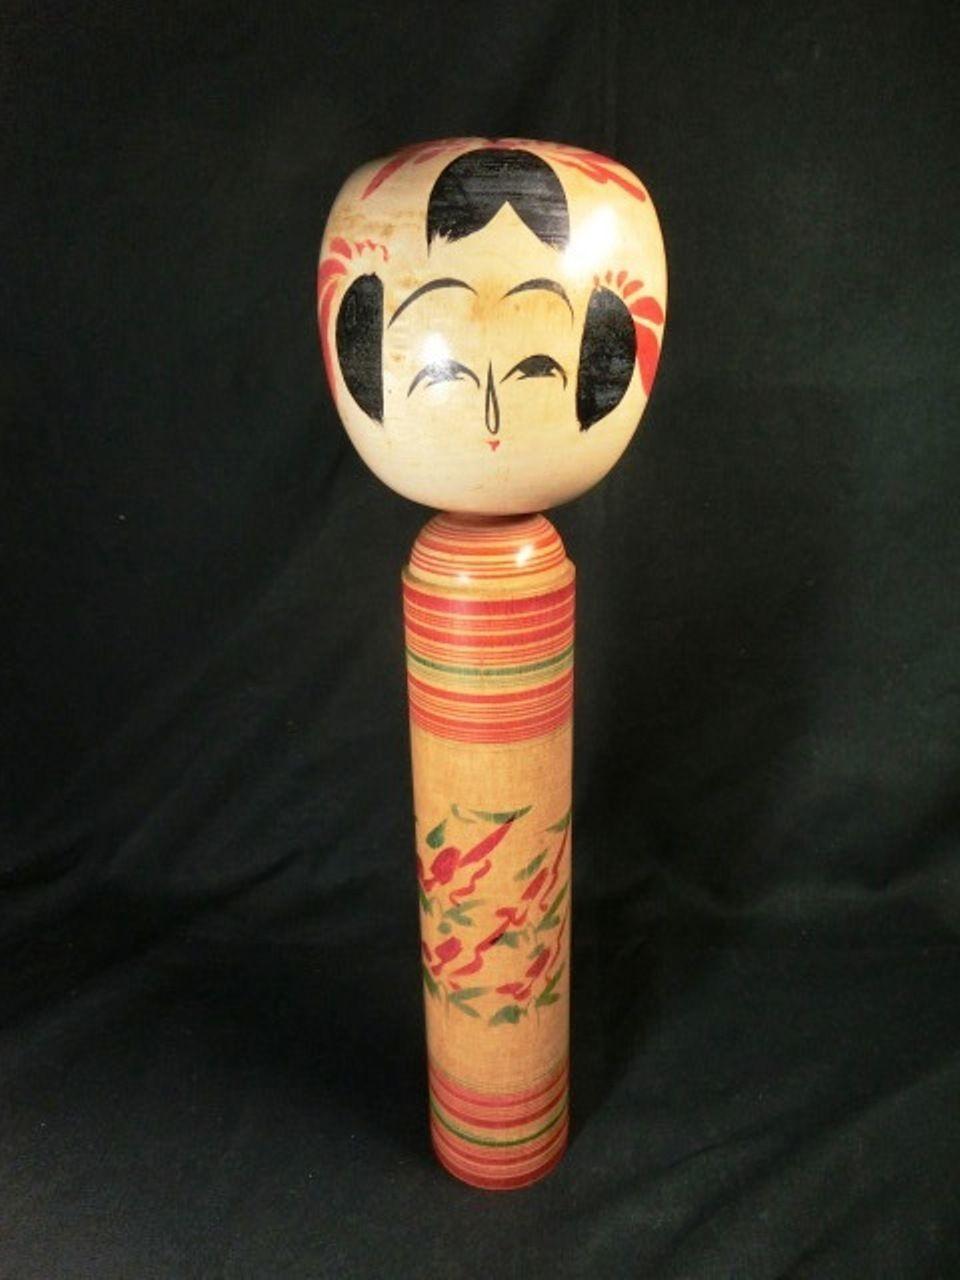 a Sukunami style made by Kenjiro Hiraga